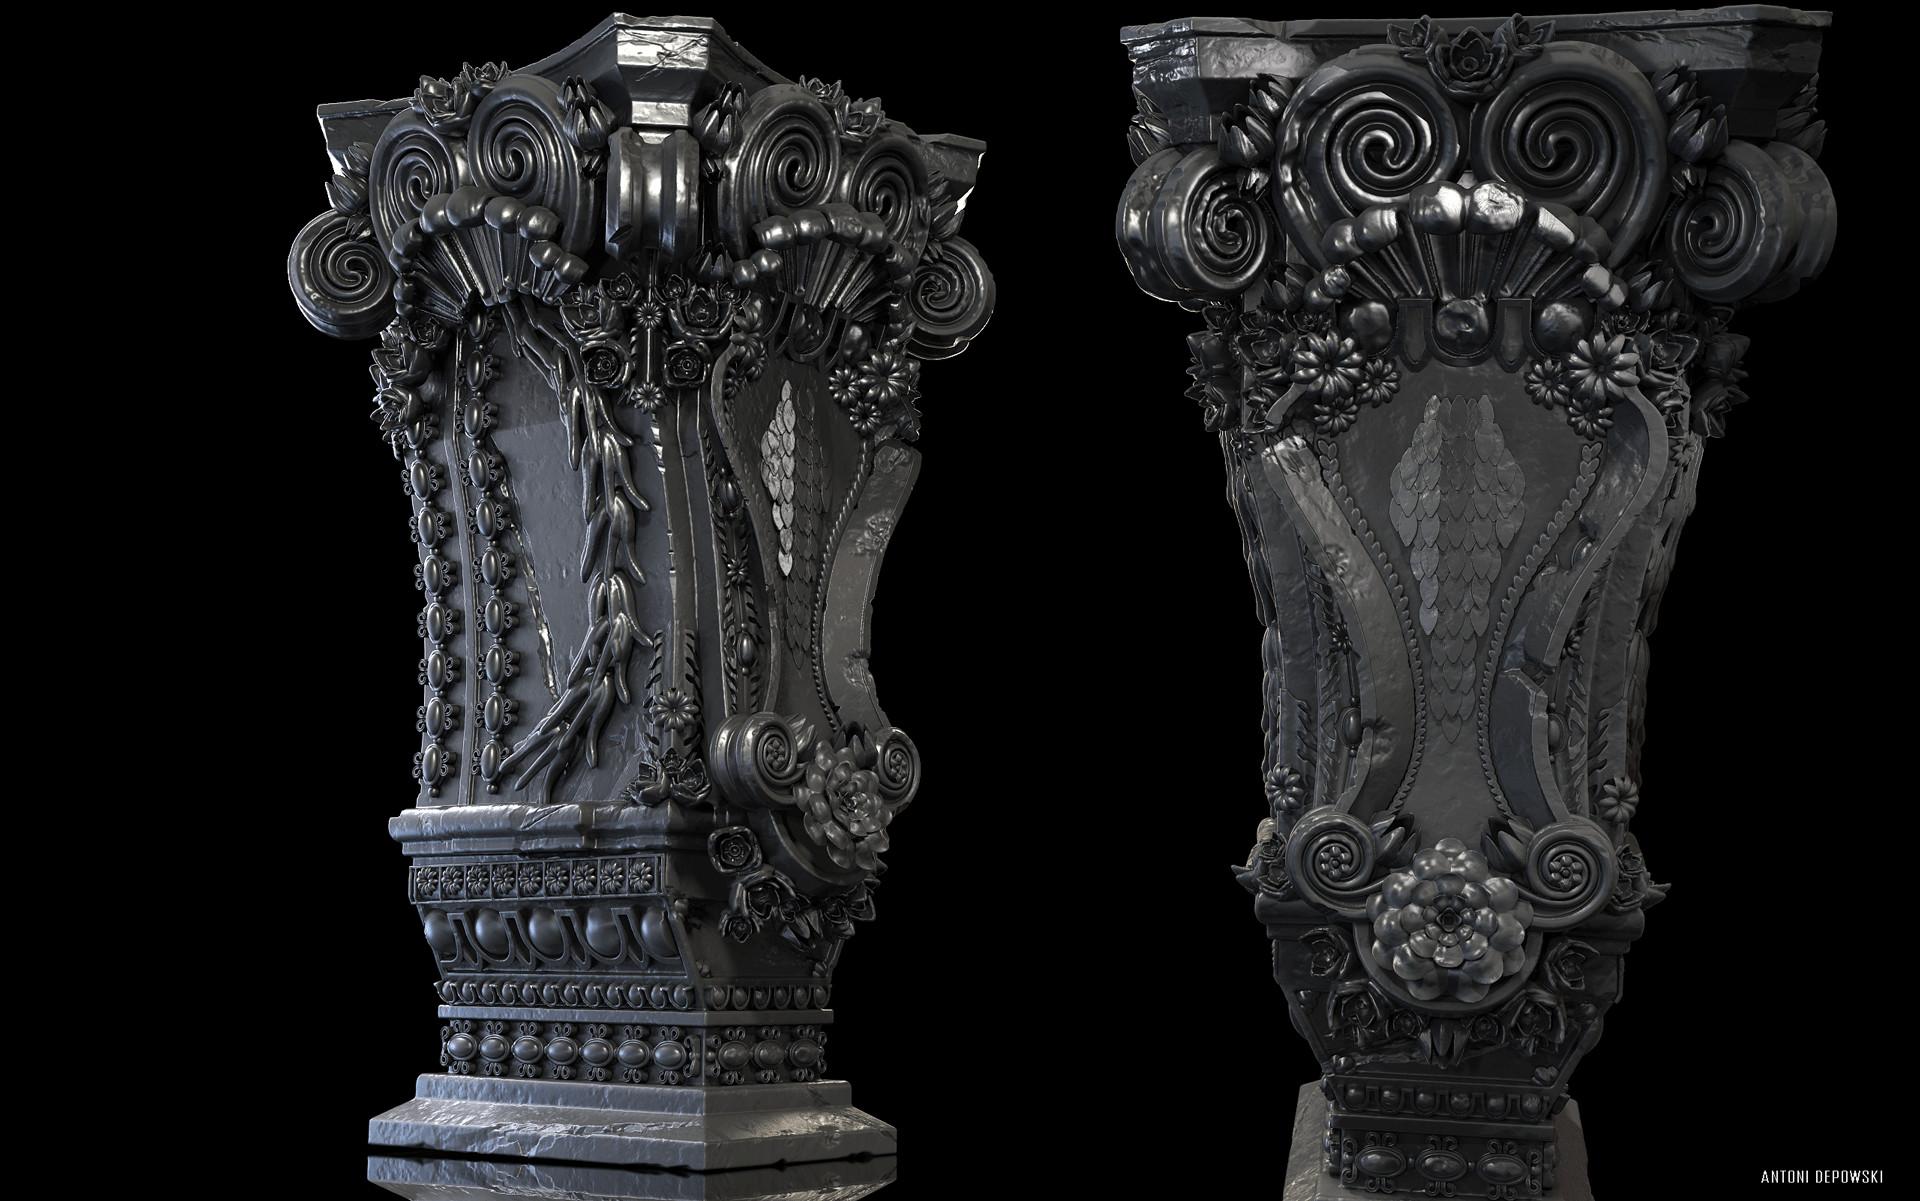 Antoni depowski baroque pedestal 4